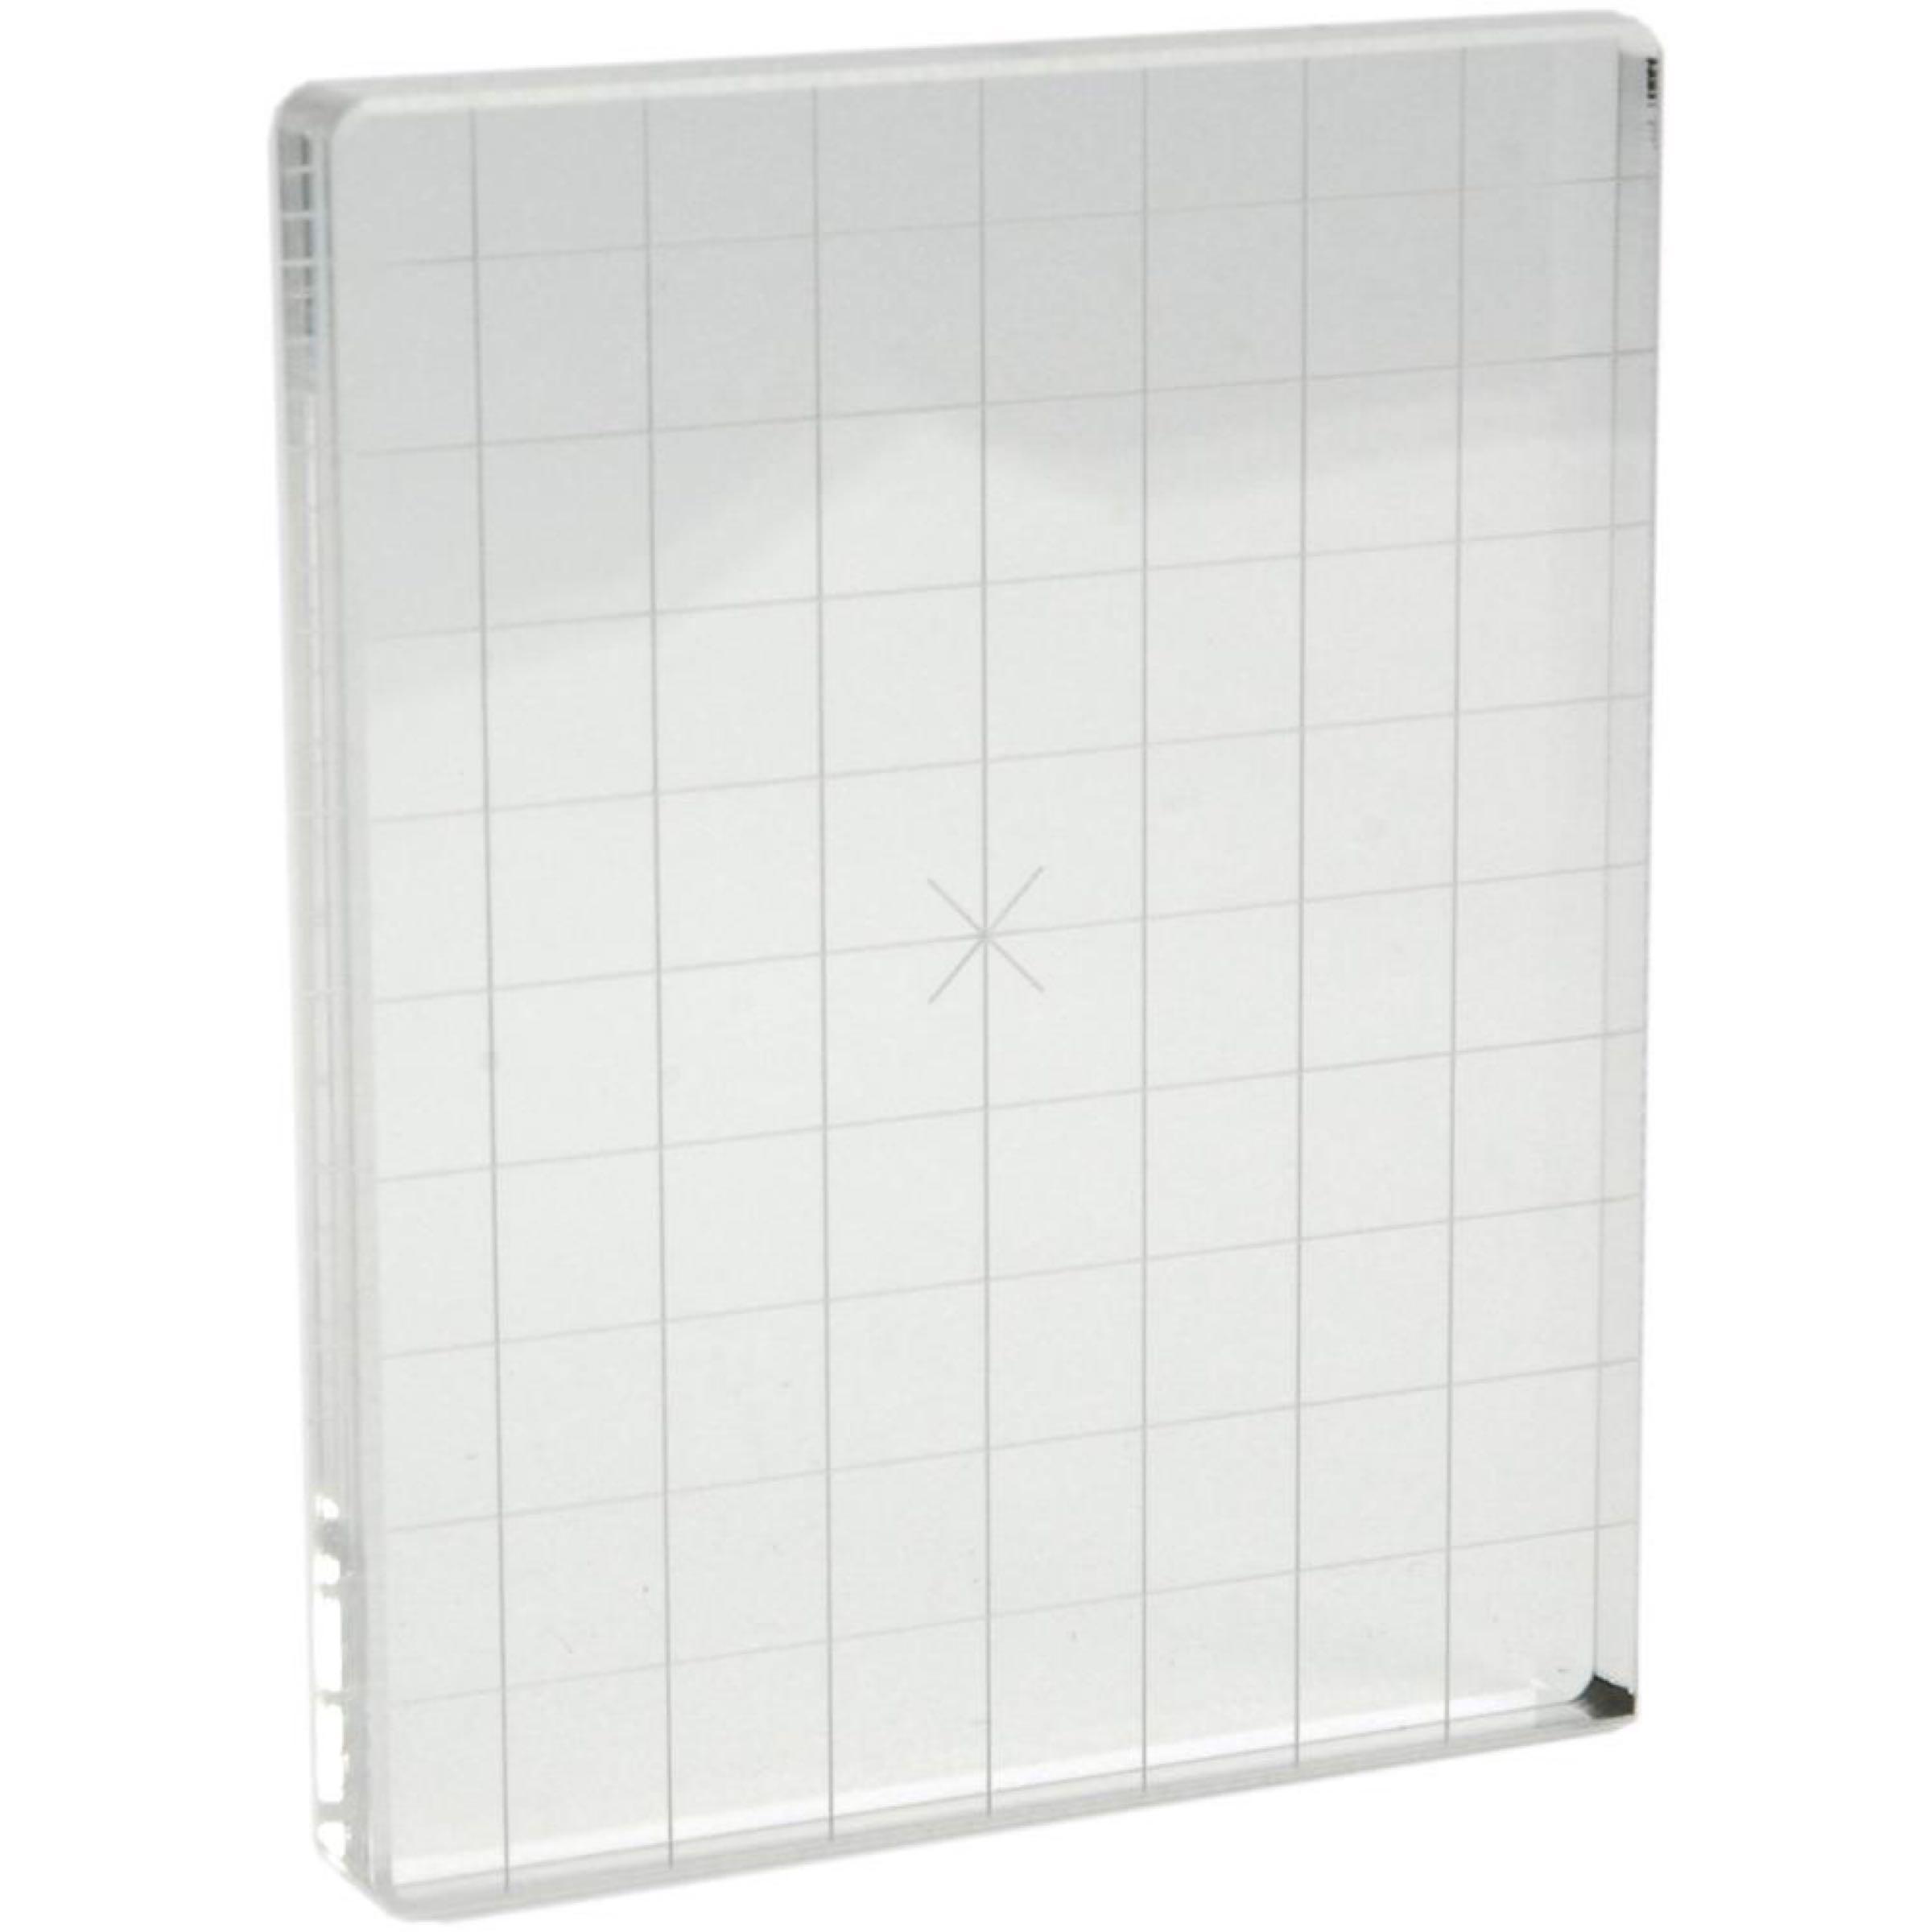 Acrylic Stamping Block with Alignment Grid /Akryl Stemplingblokk med Justeringsgitter  4